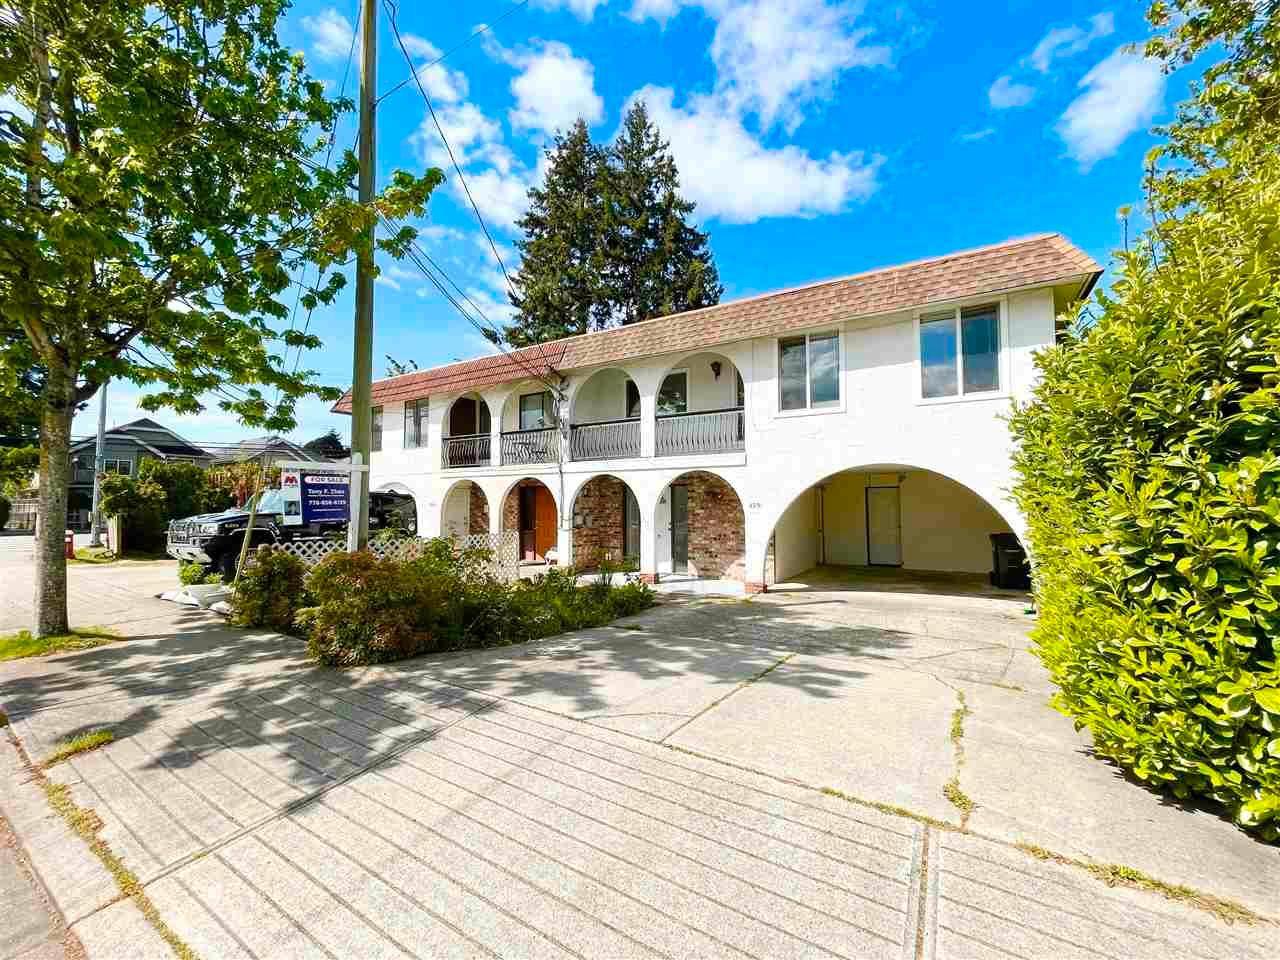 Main Photo: 8991 ST. ALBANS Road in Richmond: Garden City 1/2 Duplex for sale : MLS®# R2576083